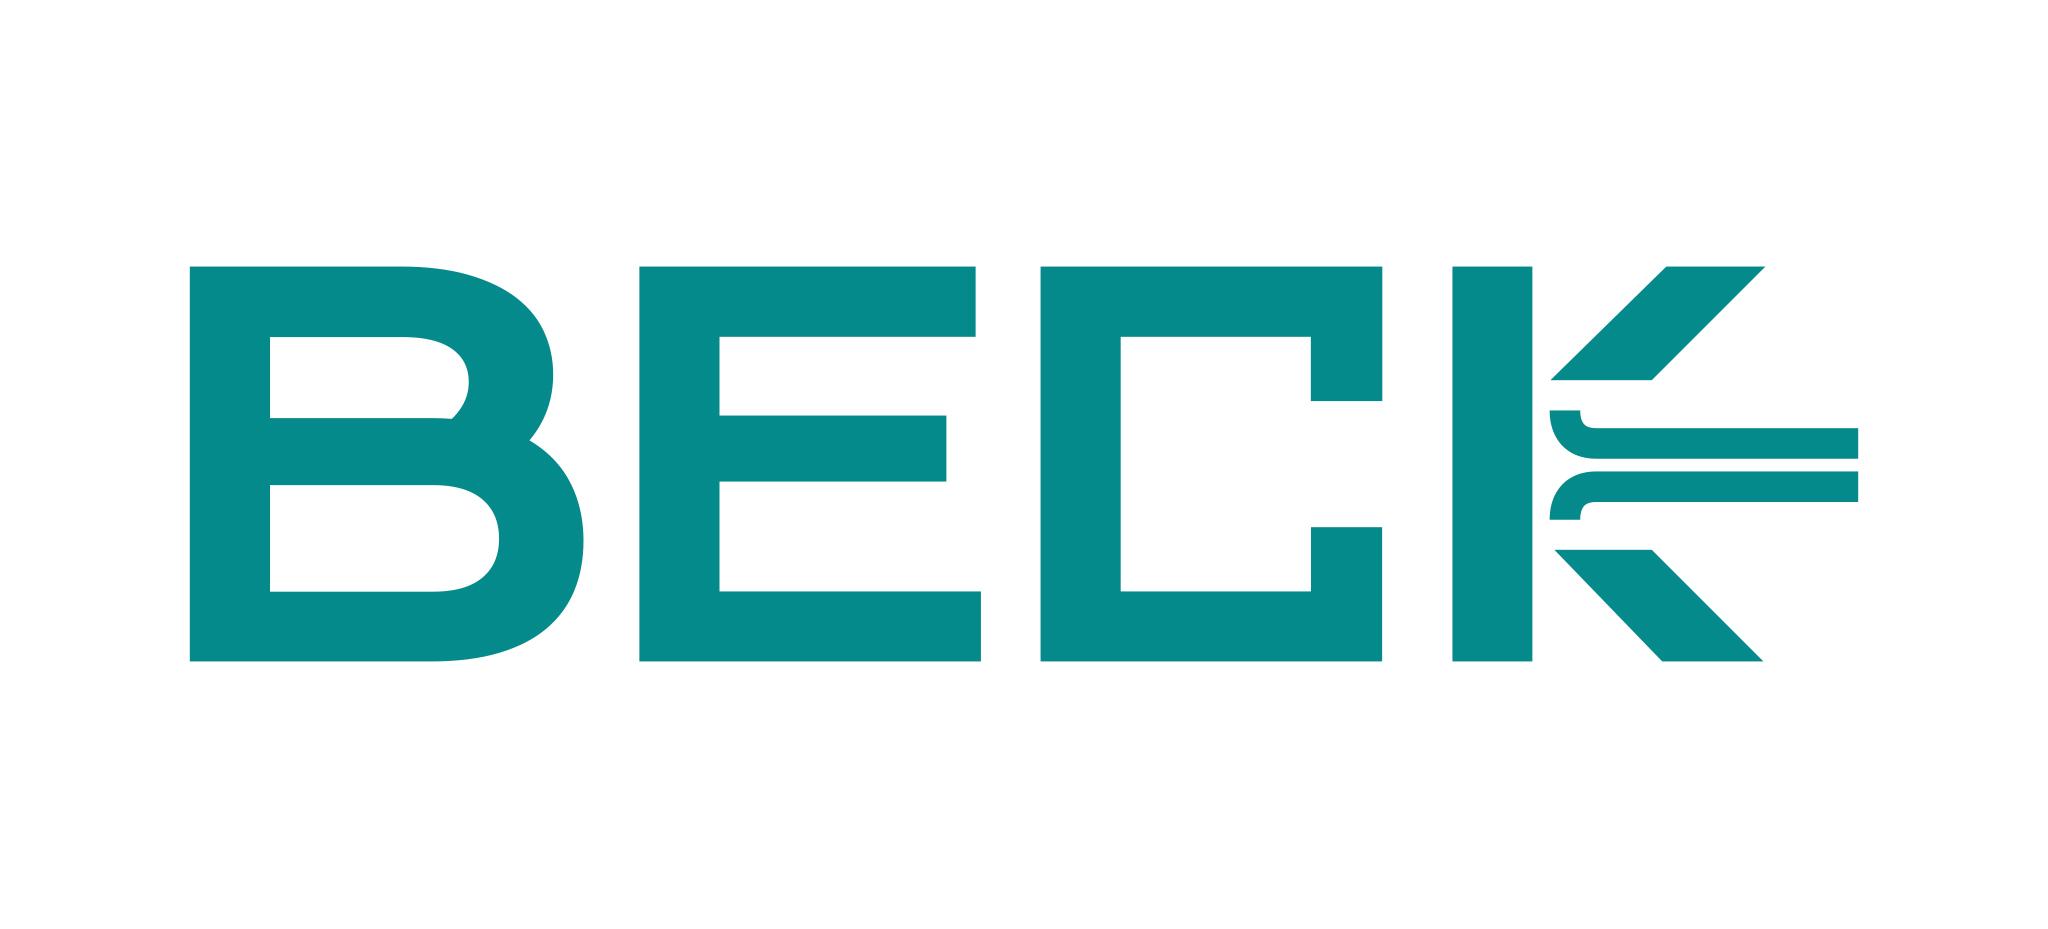 Beck Umweltschutz GmbH